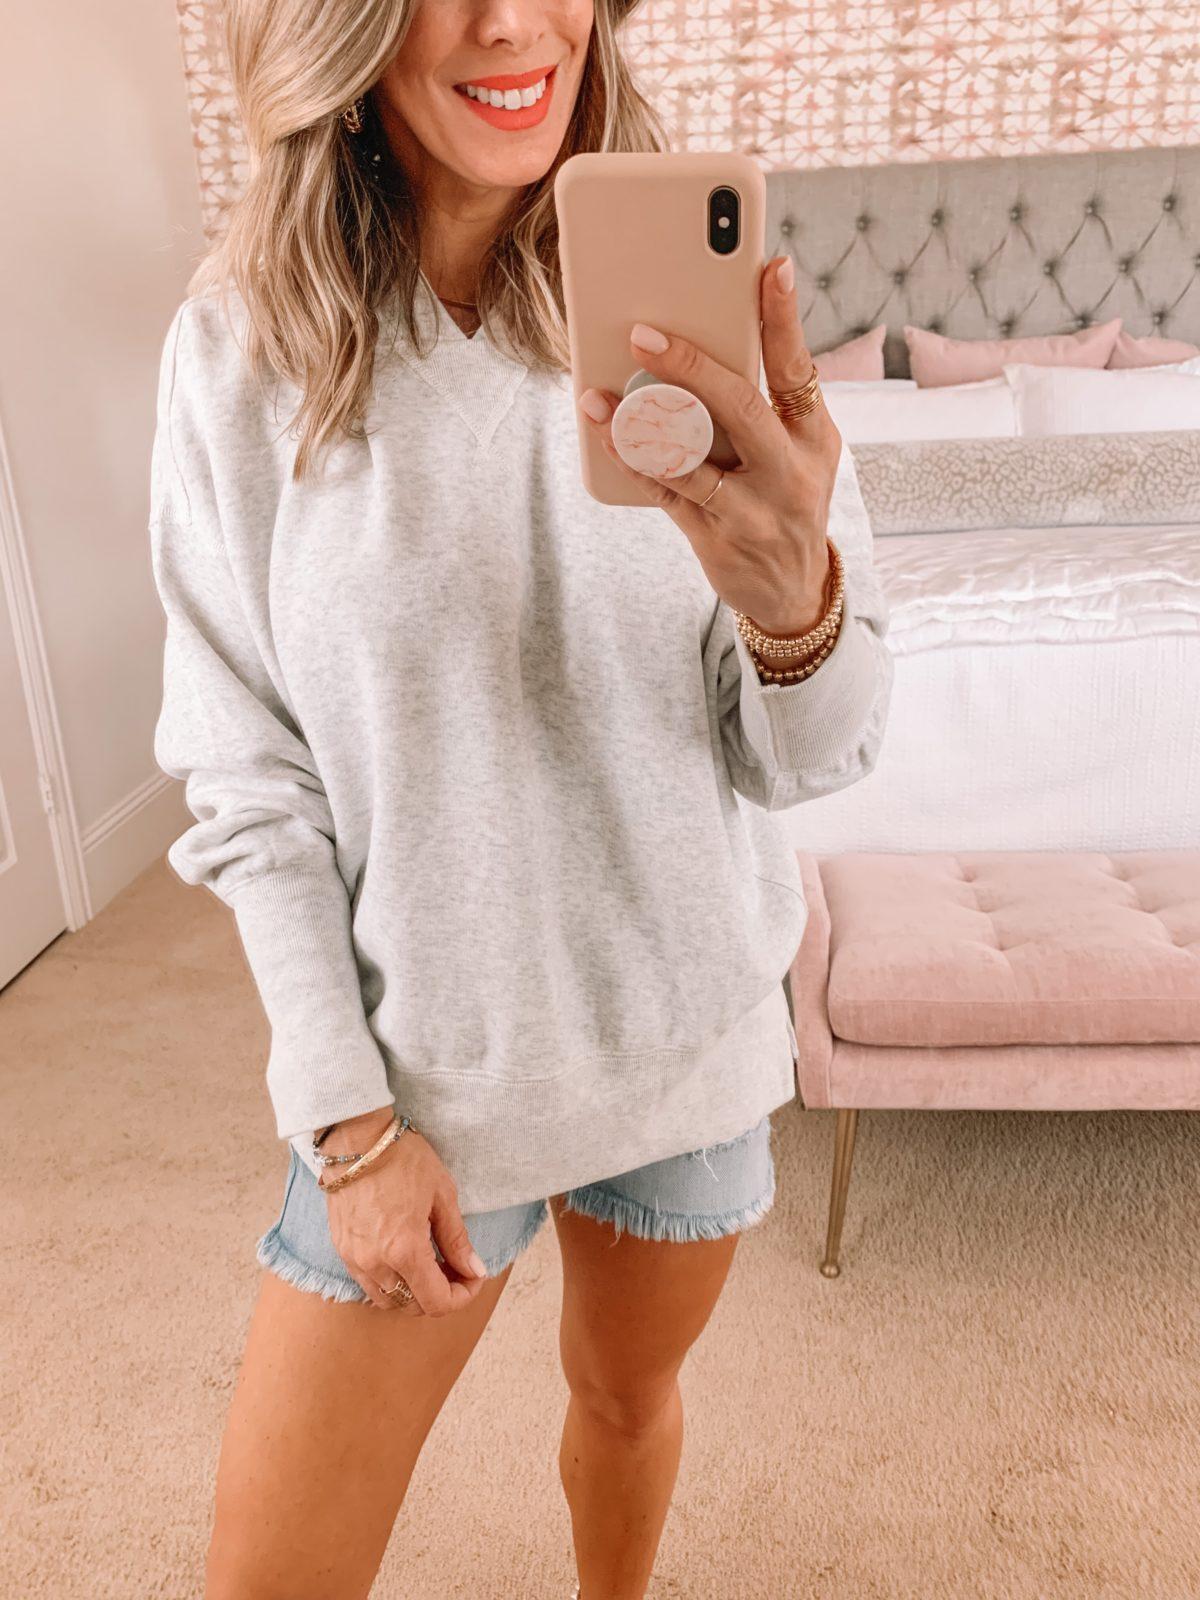 Dressing Room Finds, Abercrombie, Hoodie Sweatshirt, Shorts